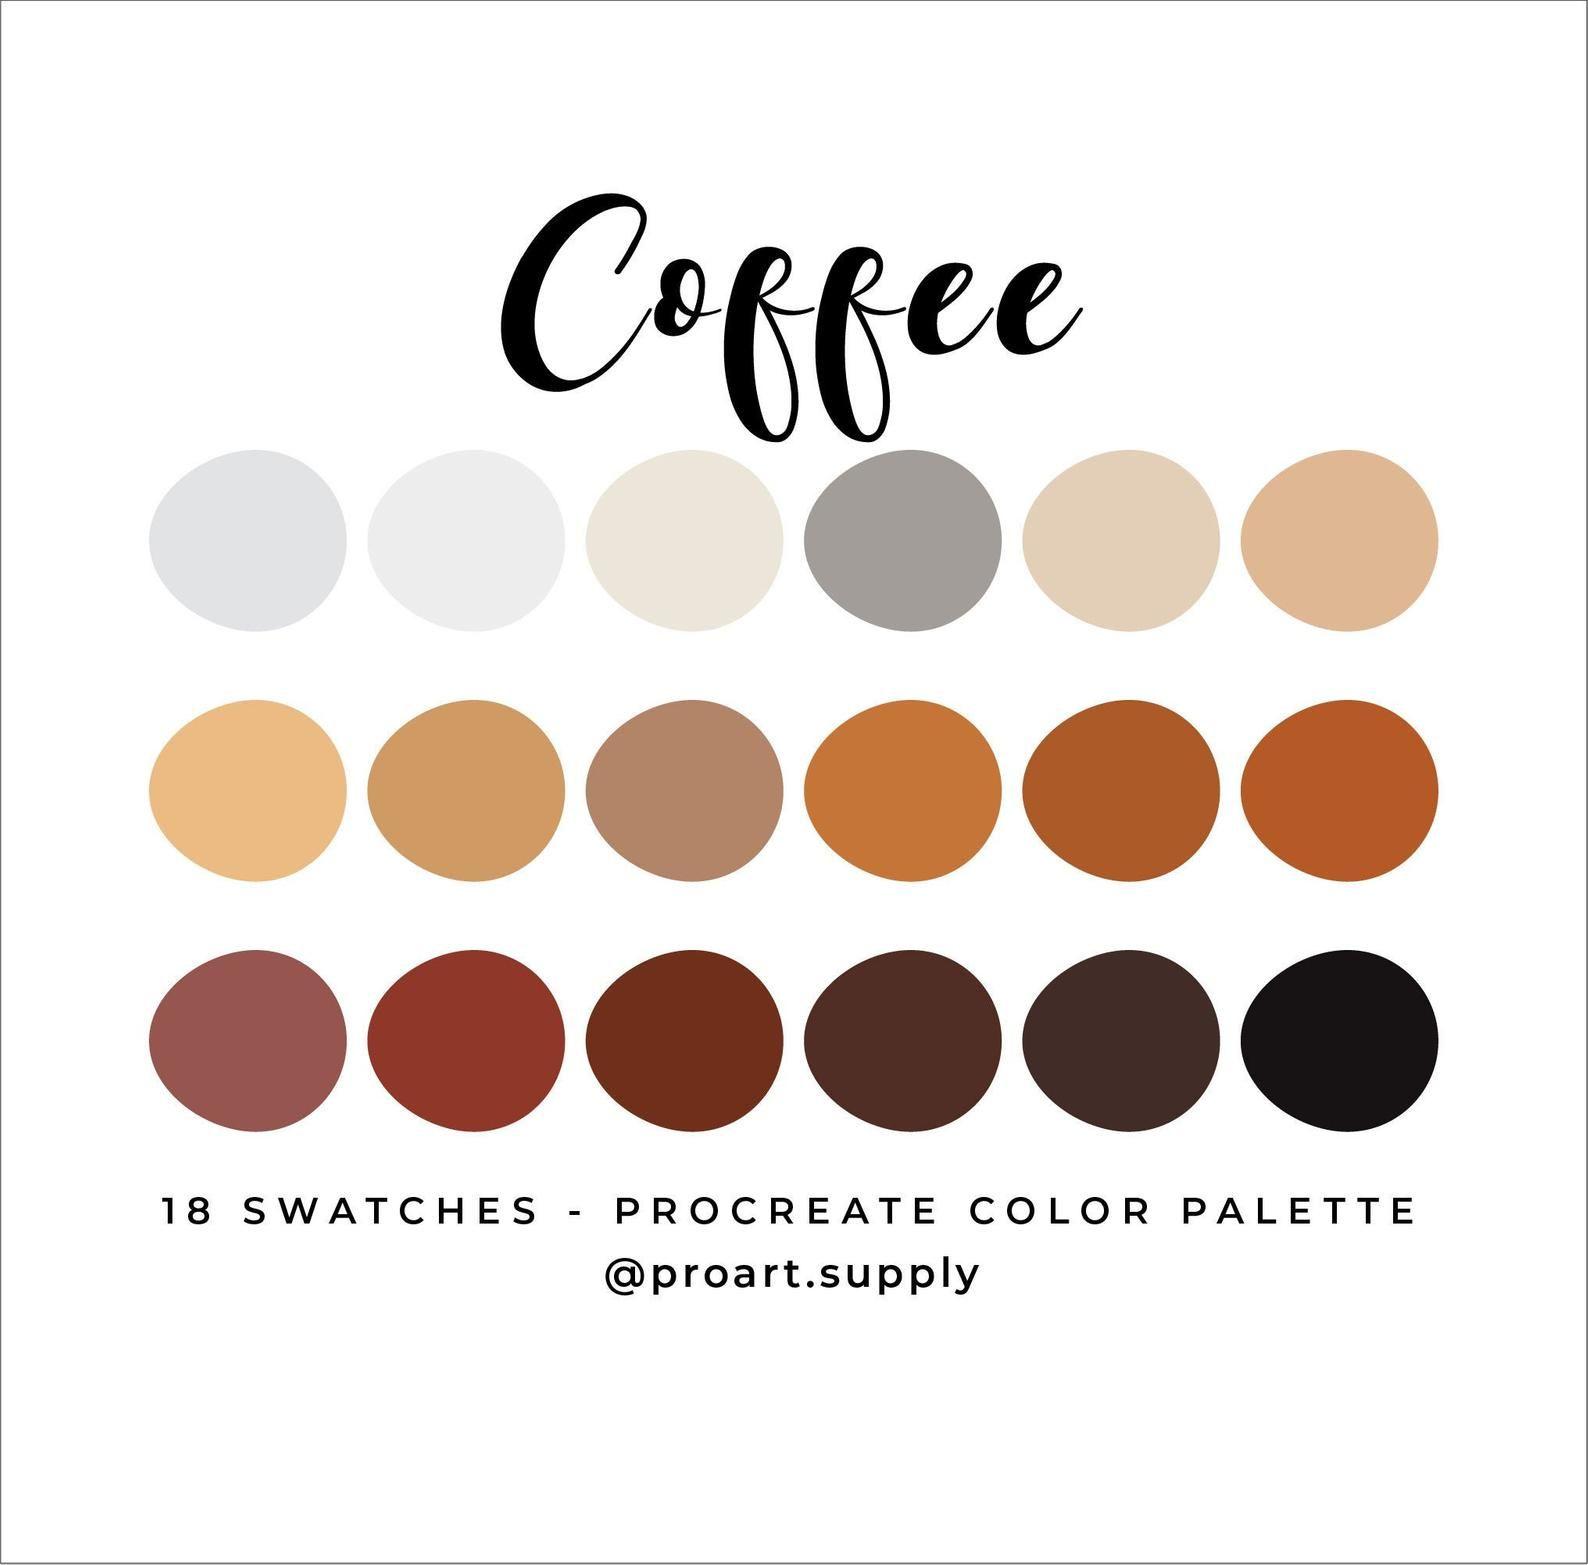 Coffee procreate color palette brown orange tan beige